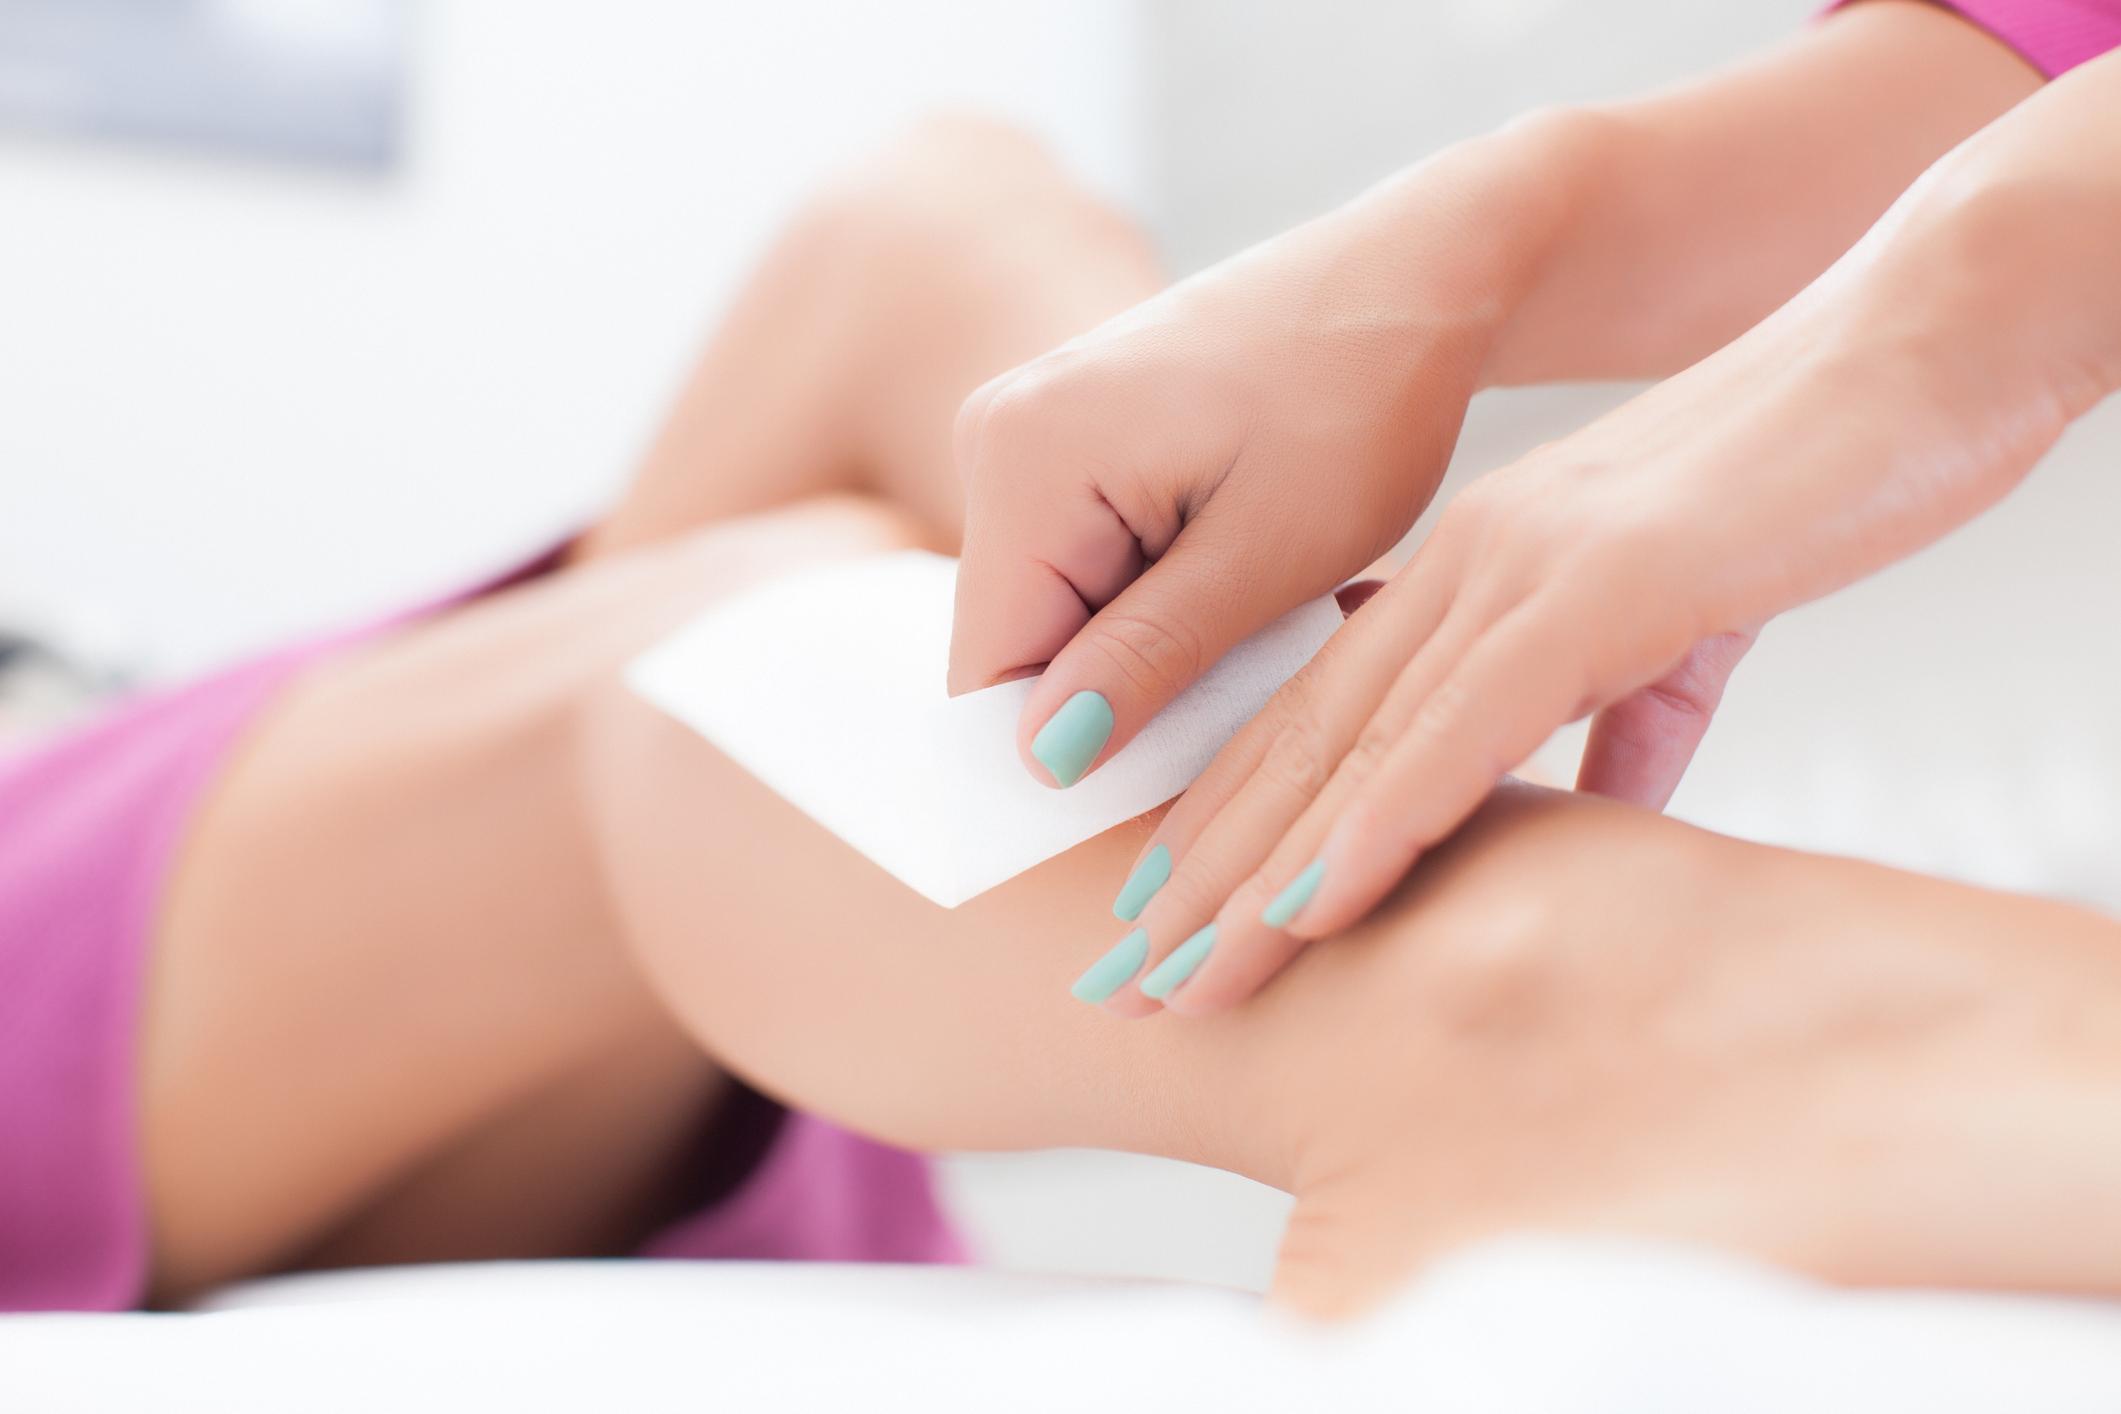 salon-thread-waxing-services.jpg